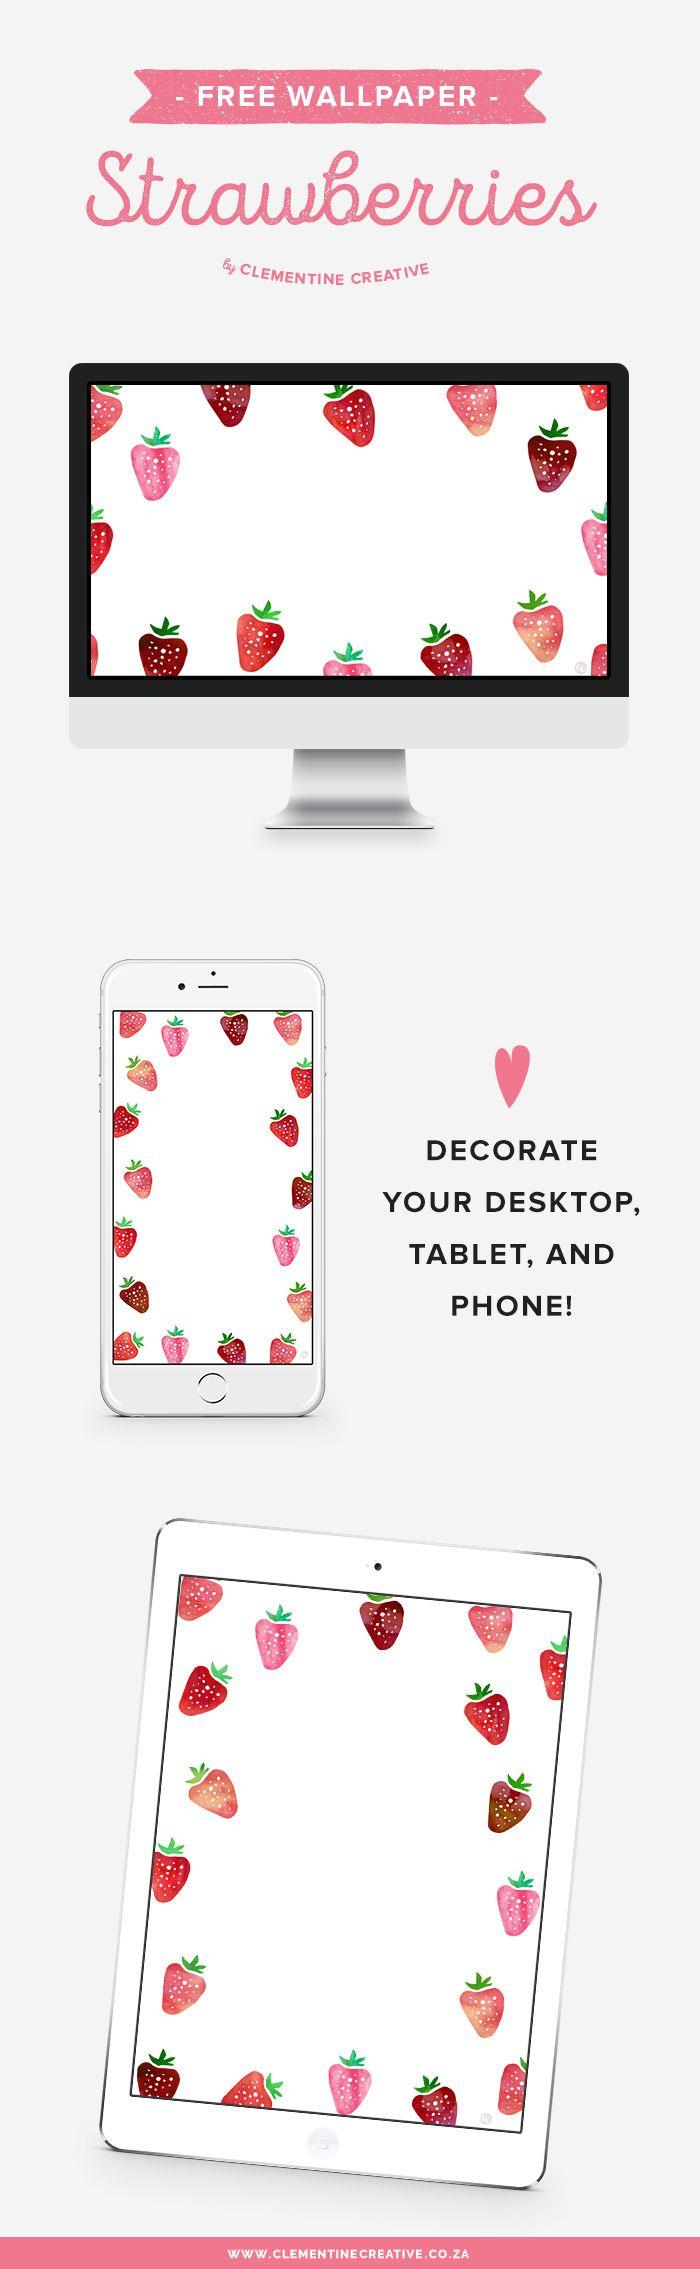 Free Wallpaper Downloads: Strawberries